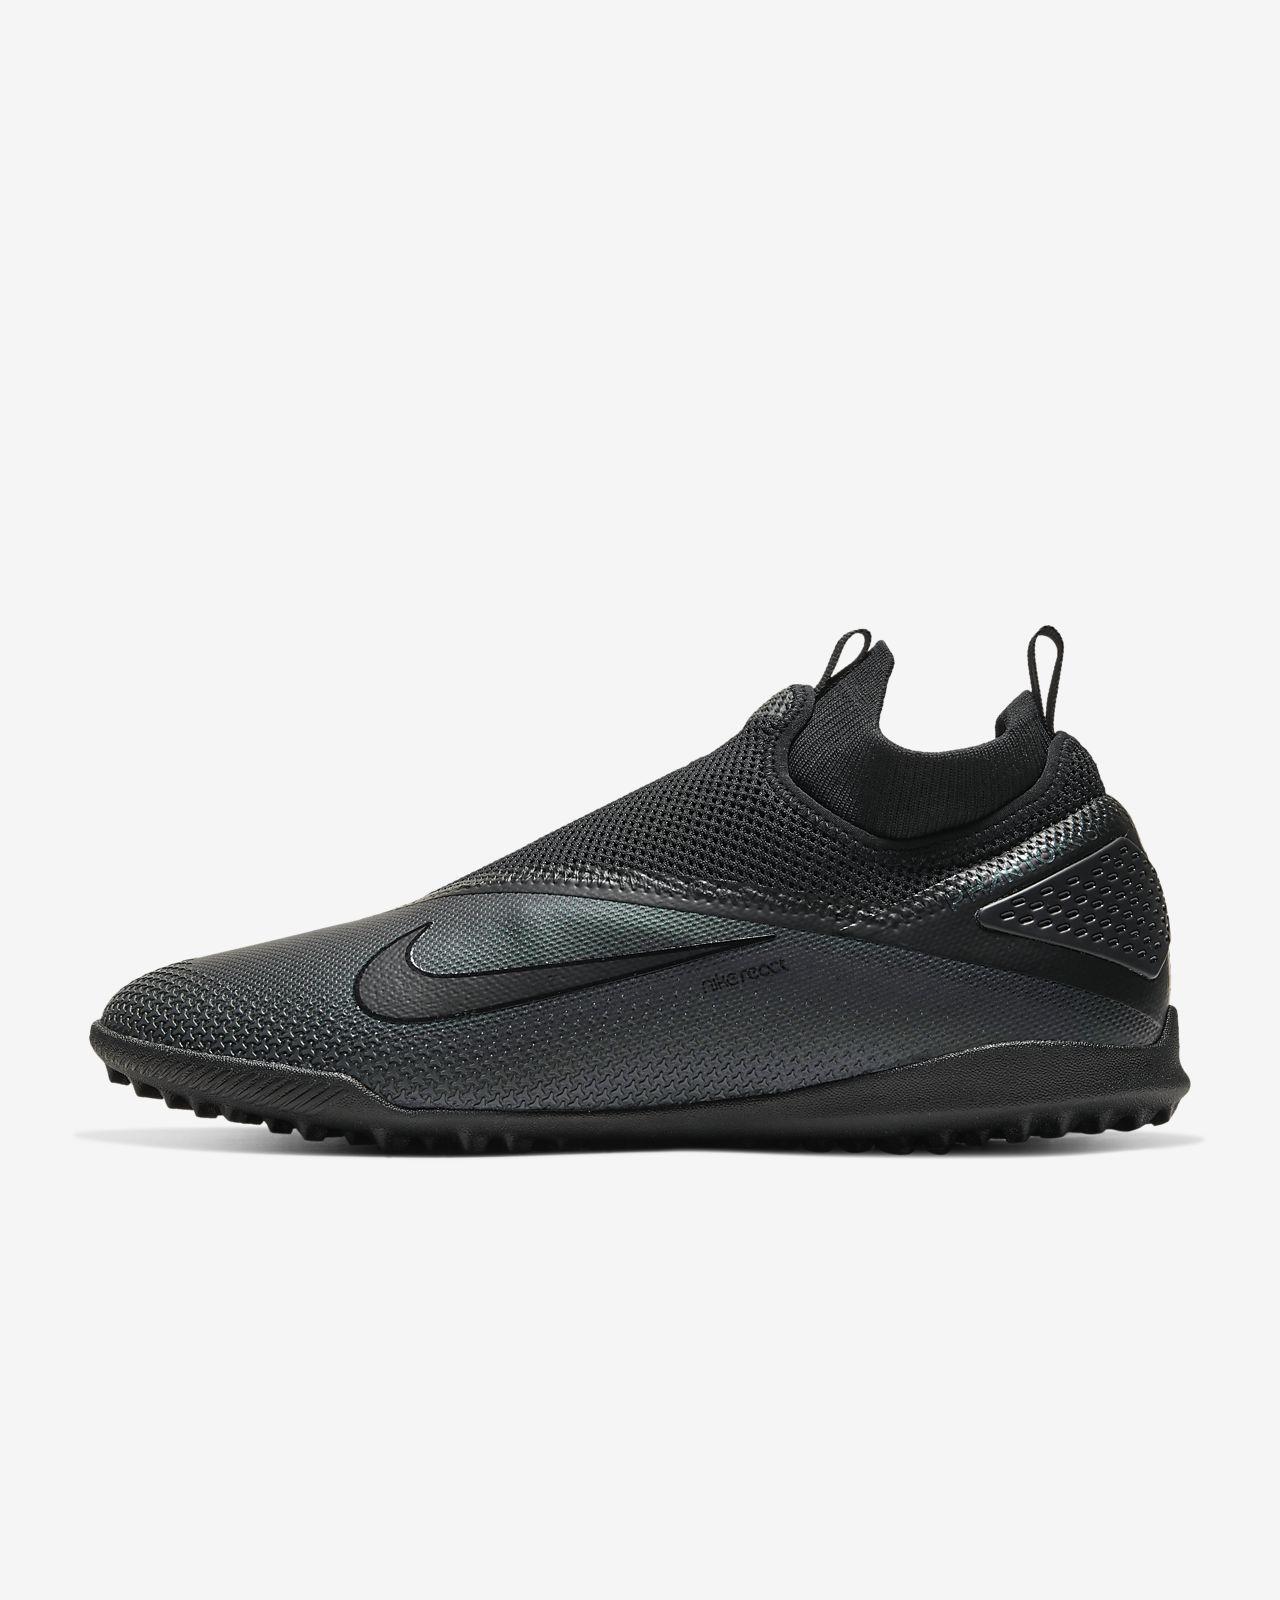 Nike React Phantom Vision 2 Pro Dynamic Fit TF Artificial-Turf Soccer Shoe